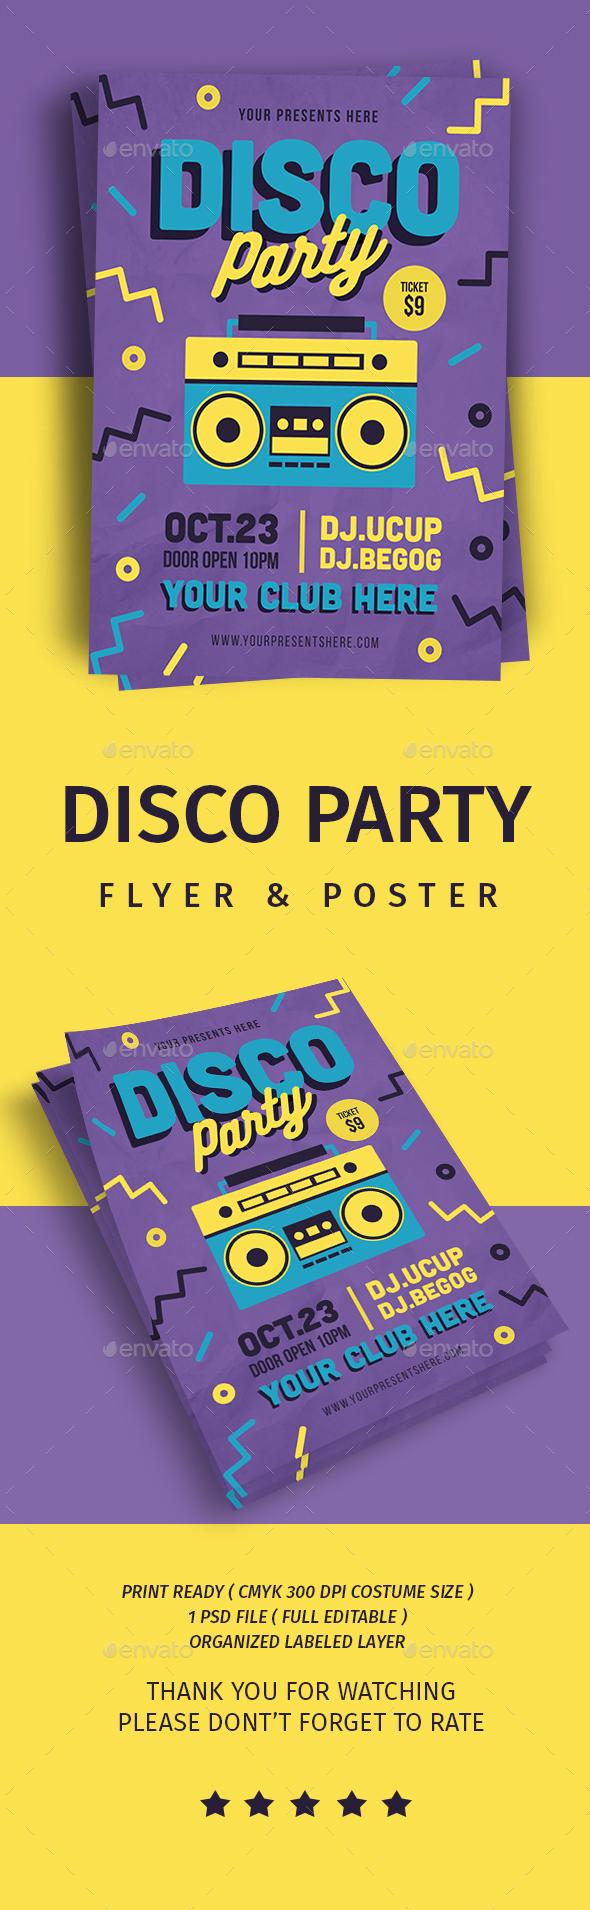 Disco Party Flyer - Flyers Print Templates